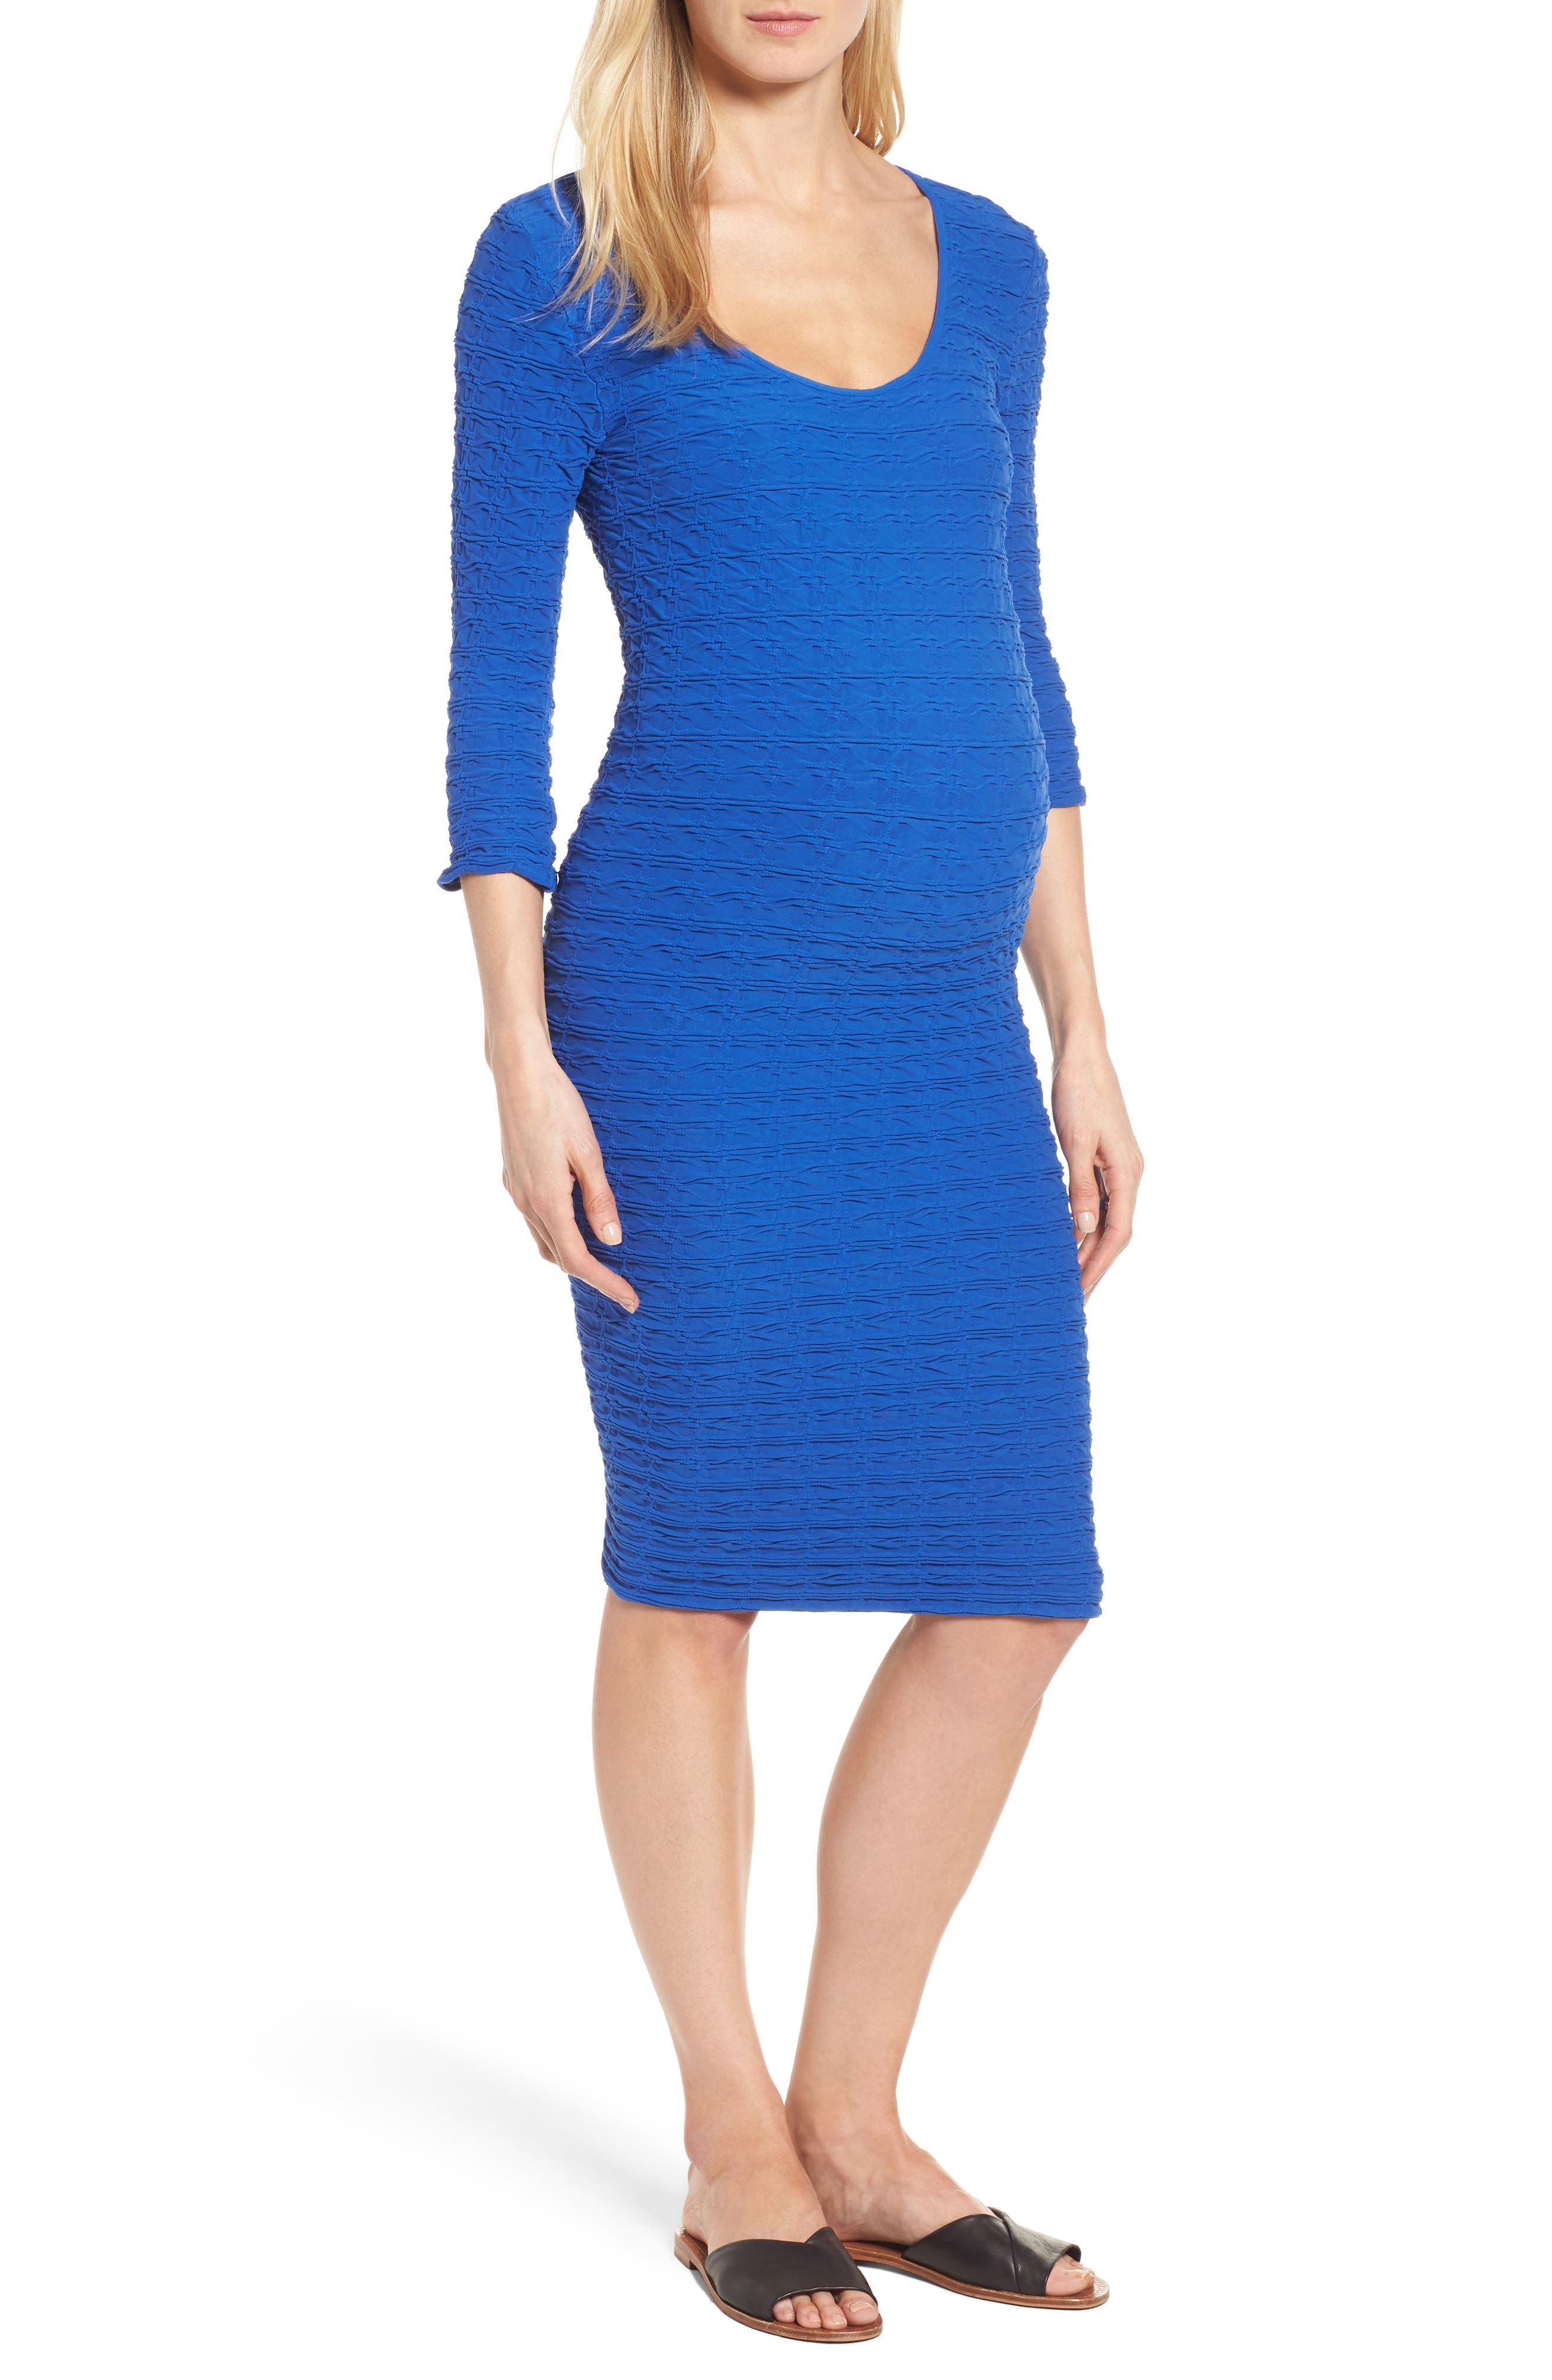 TEES BY TINA Crinkle Maternity Sheath Dress, Main, color, 400